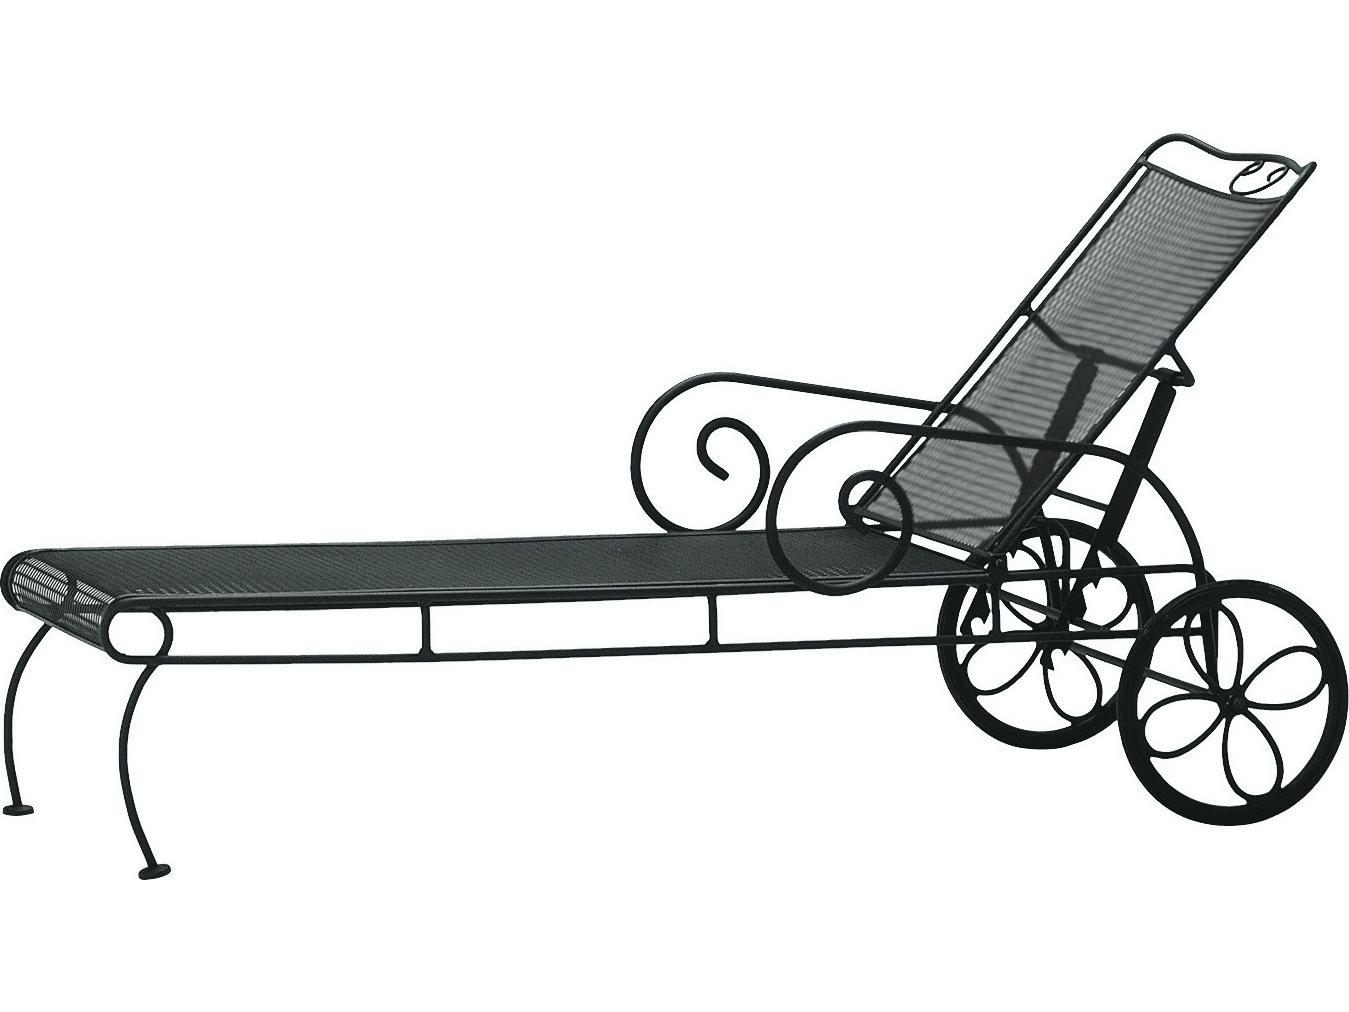 Woodard Cantebury Wrought Iron Adjustable Chaise Lounge